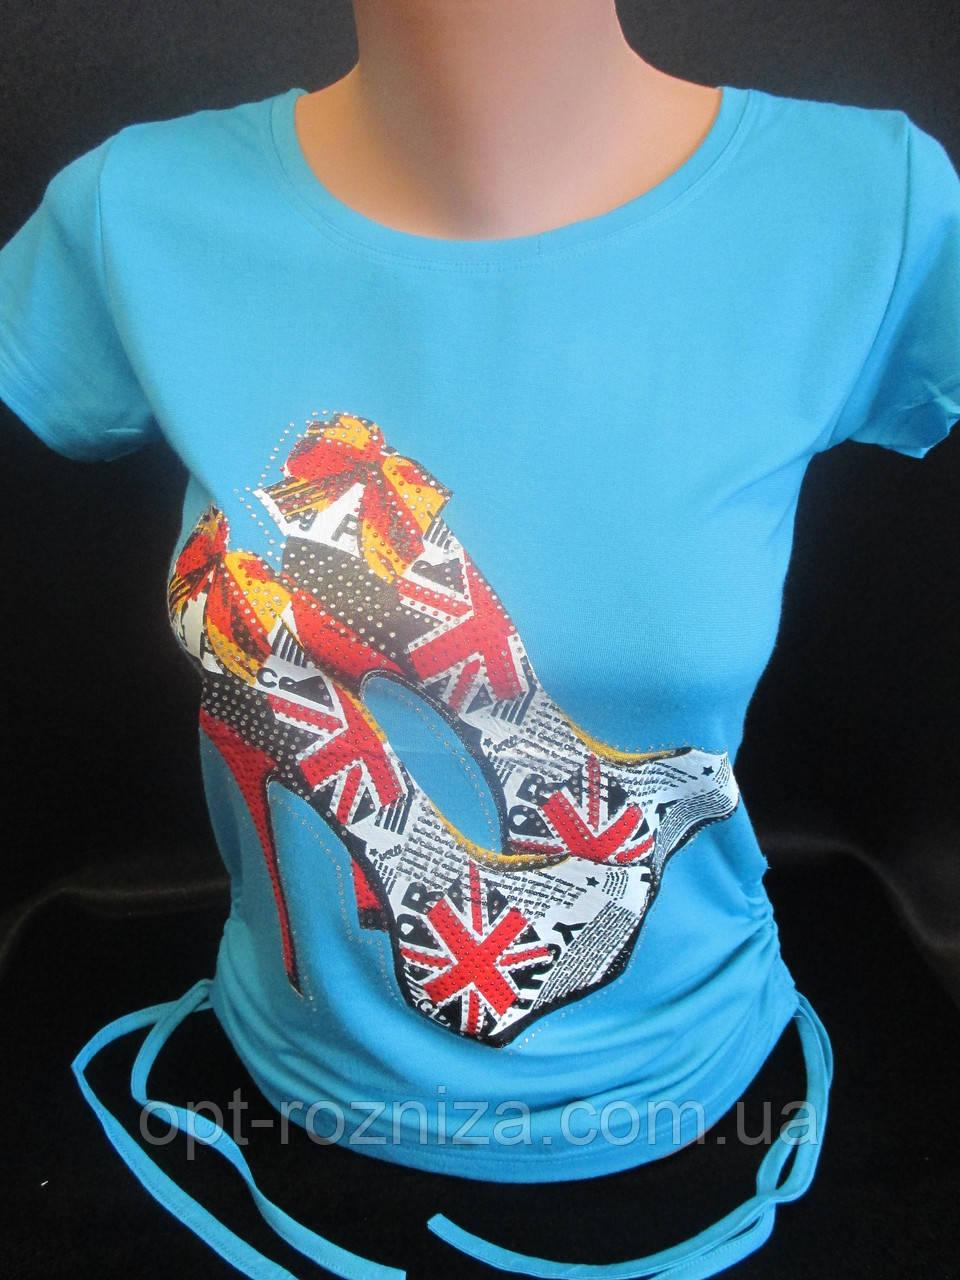 Летние футболки с рисунком и стразами.